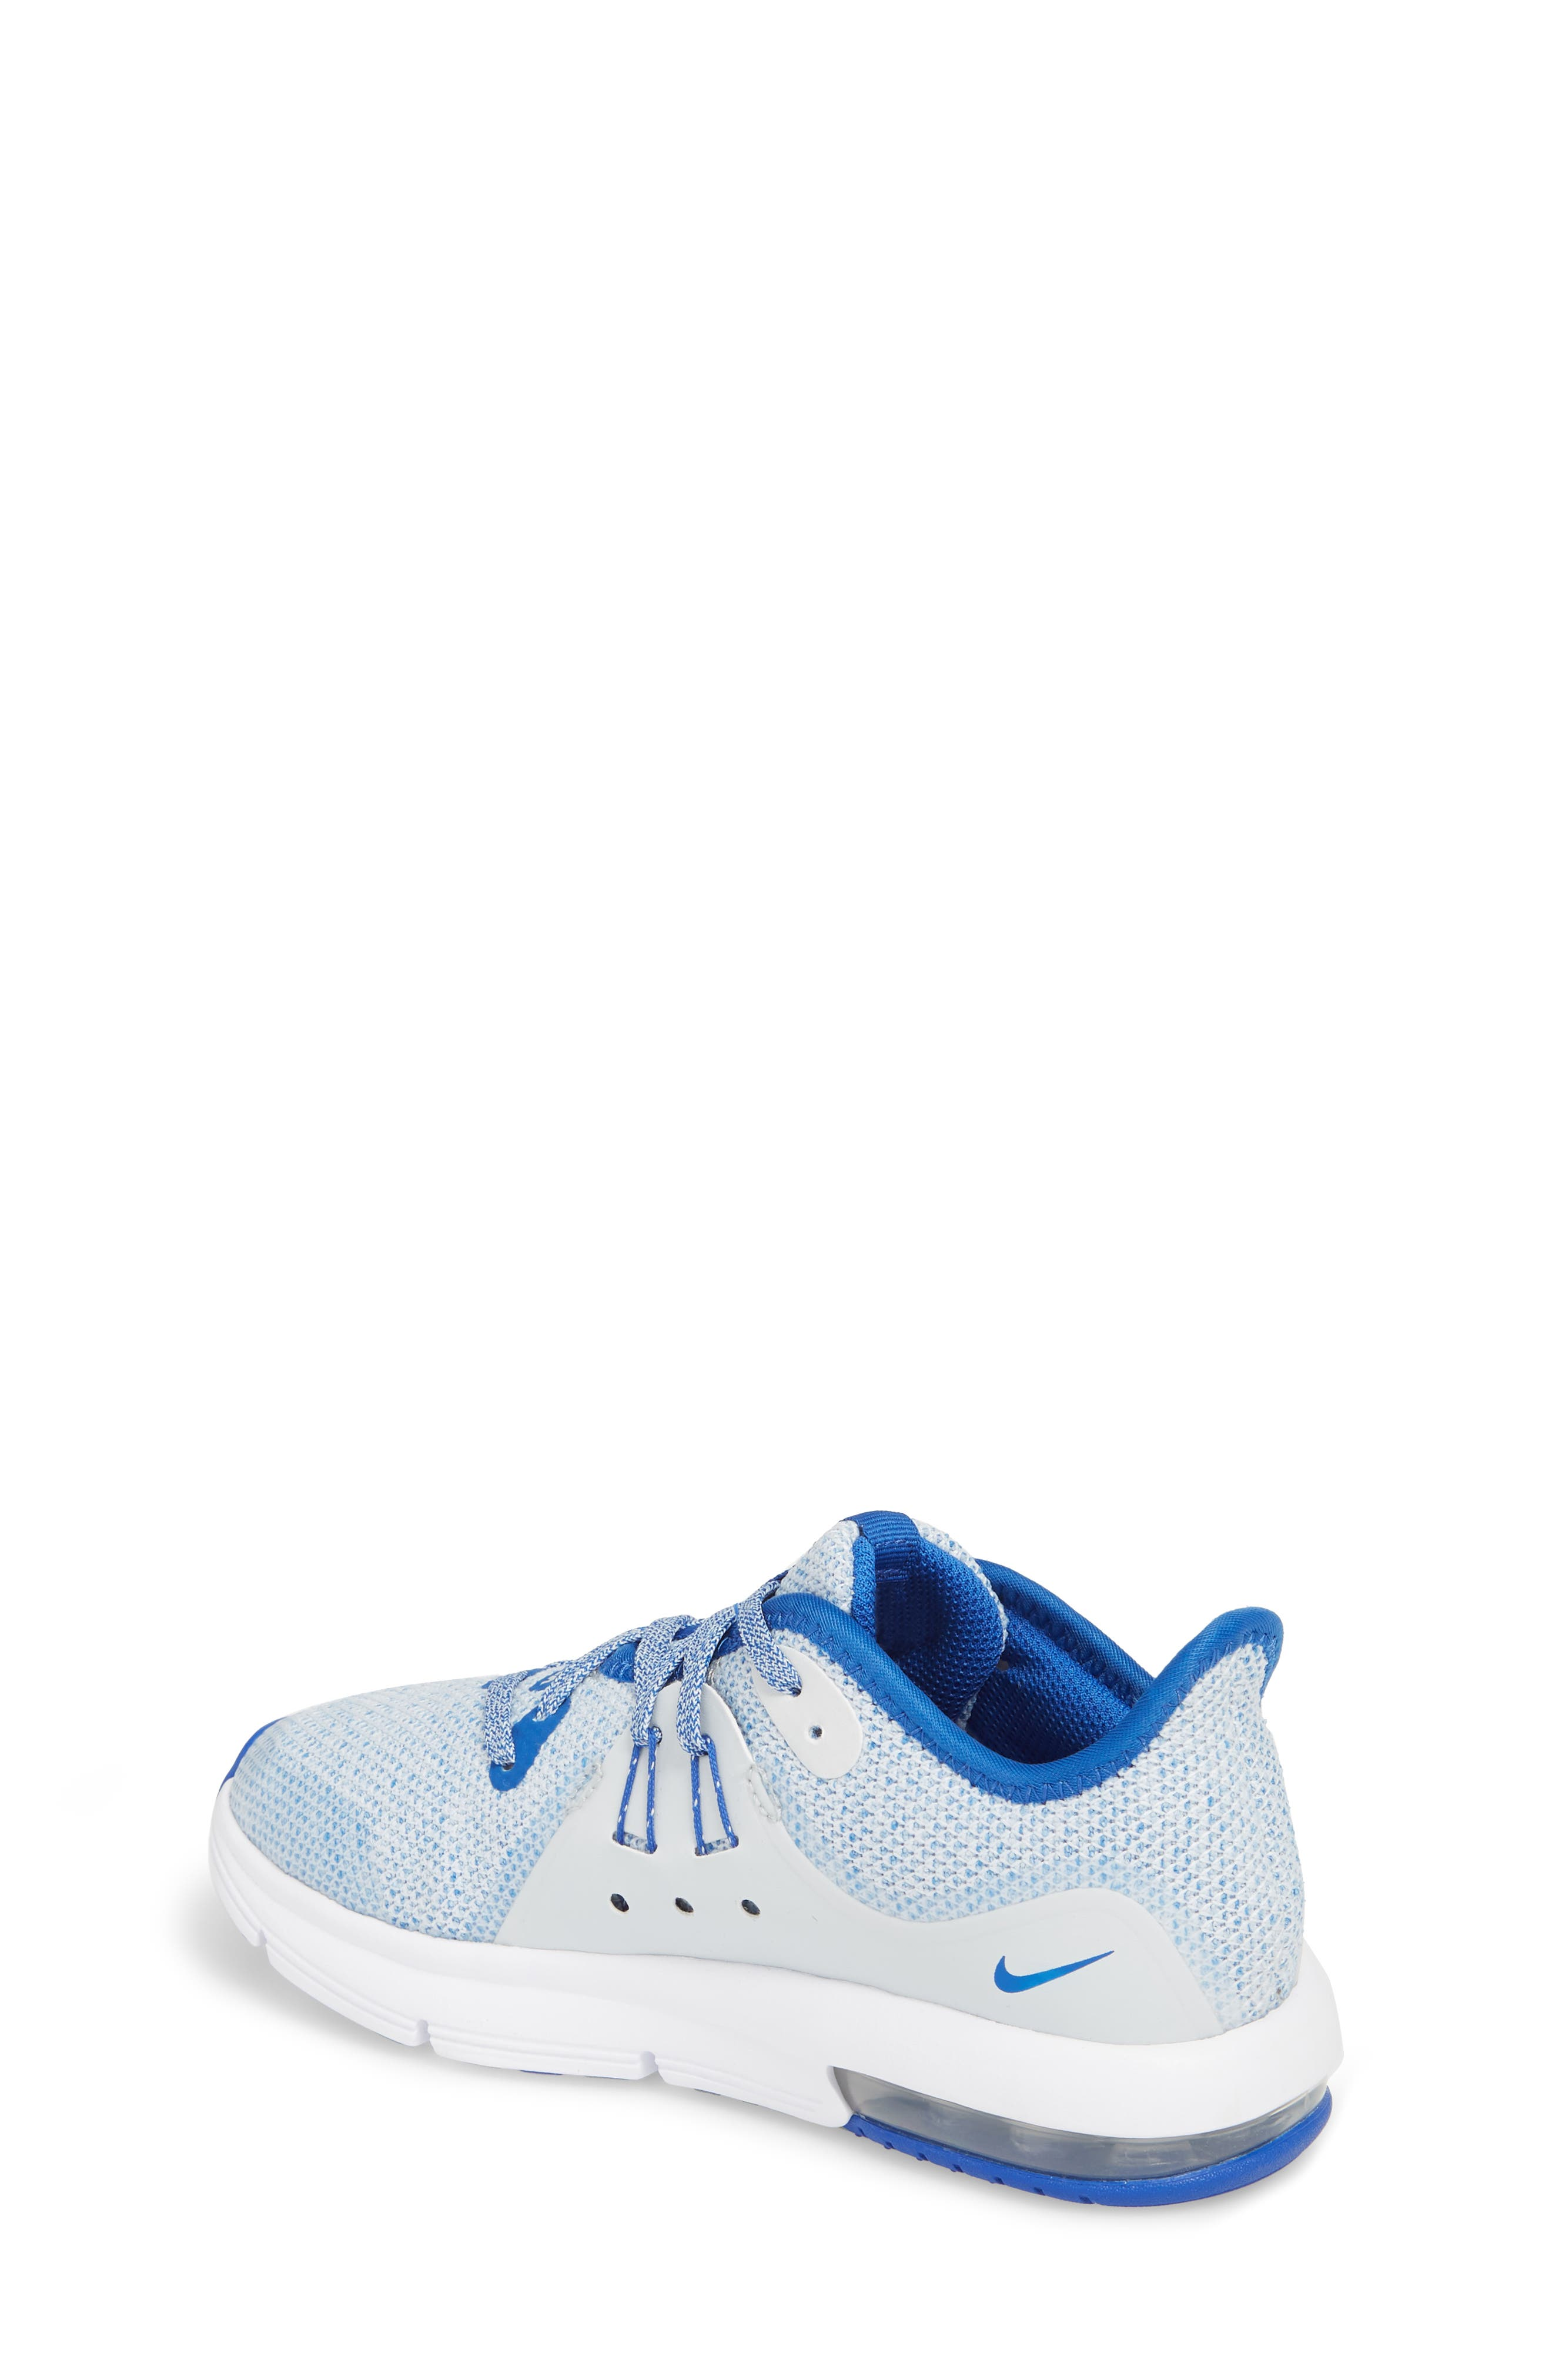 Alternate Image 2  - Nike Air Max Sequent 3 GS Running Shoe (Toddler, Little Kid & Big Kid)